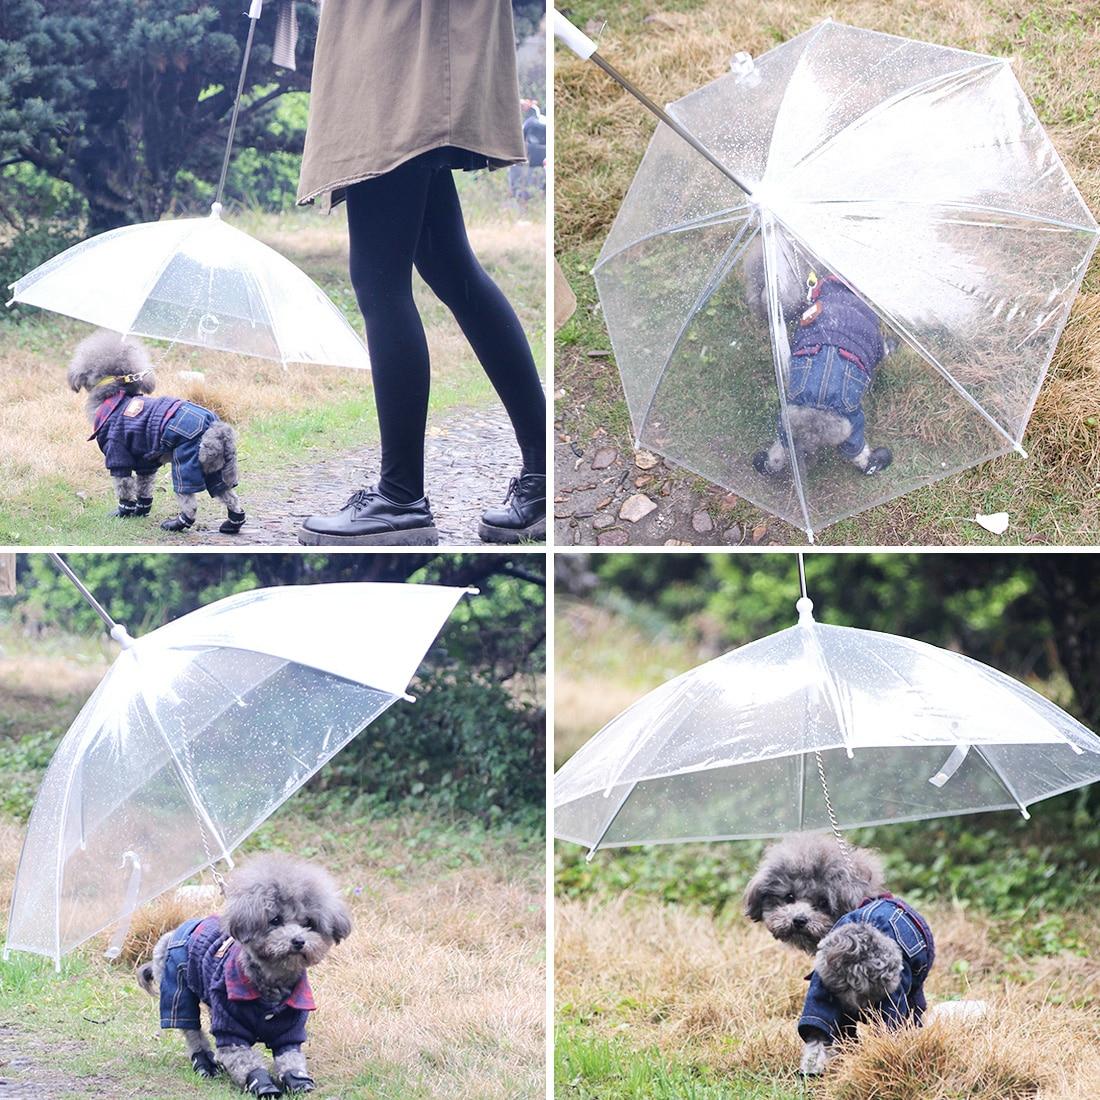 Useful Transparent Pet Cat Umbrella Small Dog Umbrella Rain Gear With Dog Leads Keeps Pet Dry Comfortable In Rain Snowing